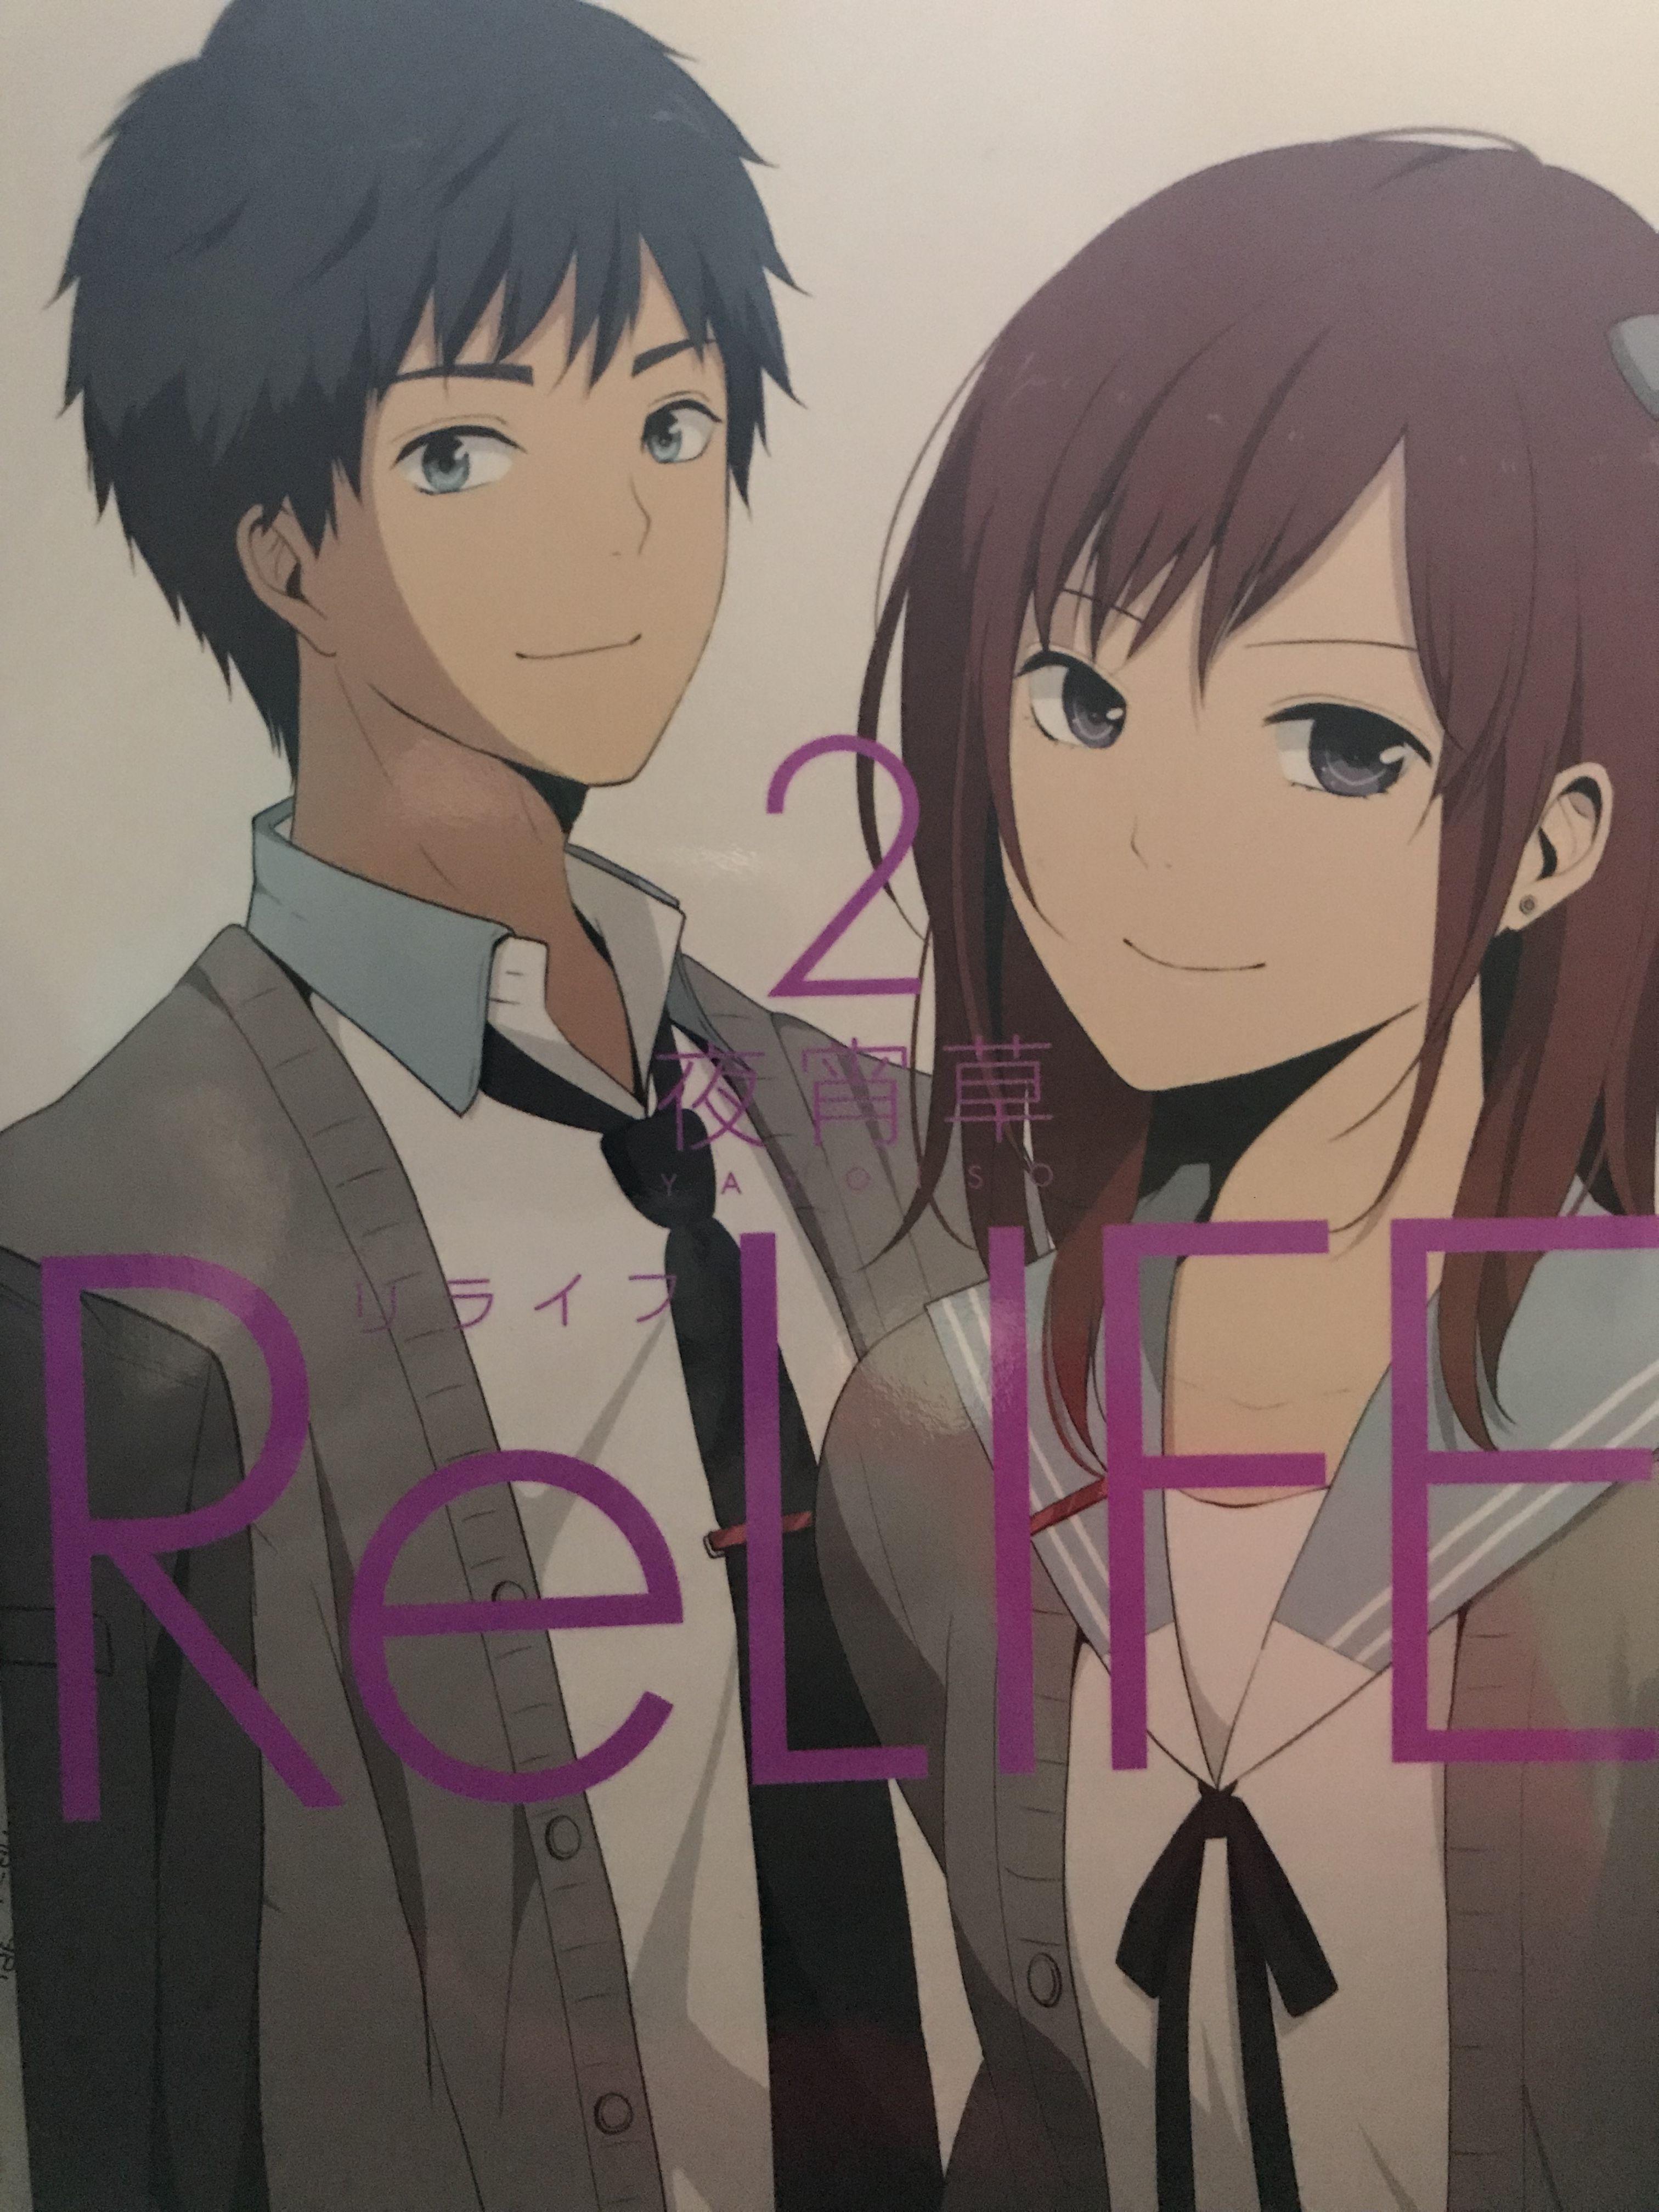 Pin by Gwyn Jeffers on ReLife Anime Manga, Anime